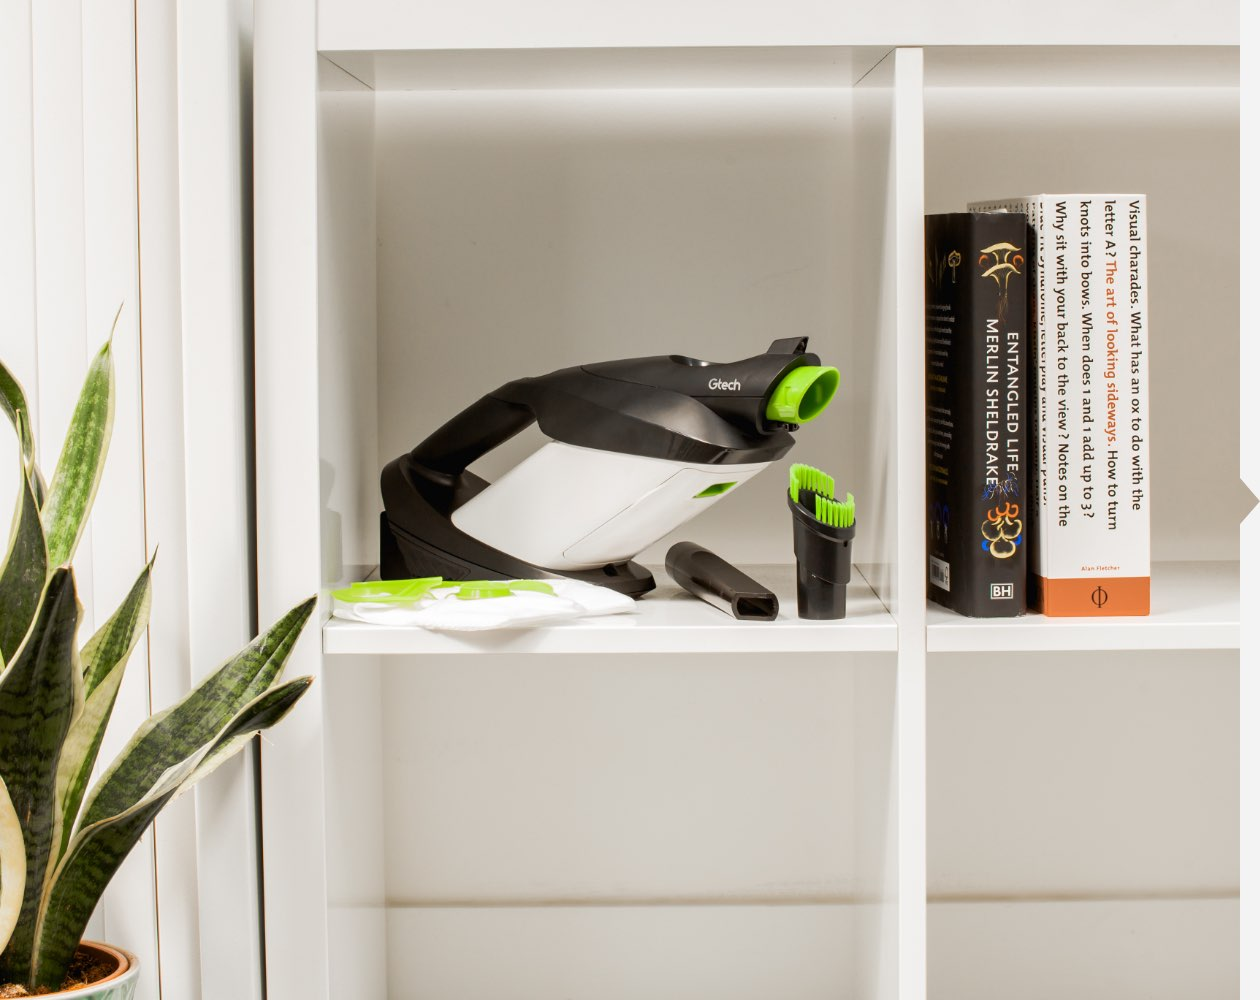 Compact ProLite handheld vacuum